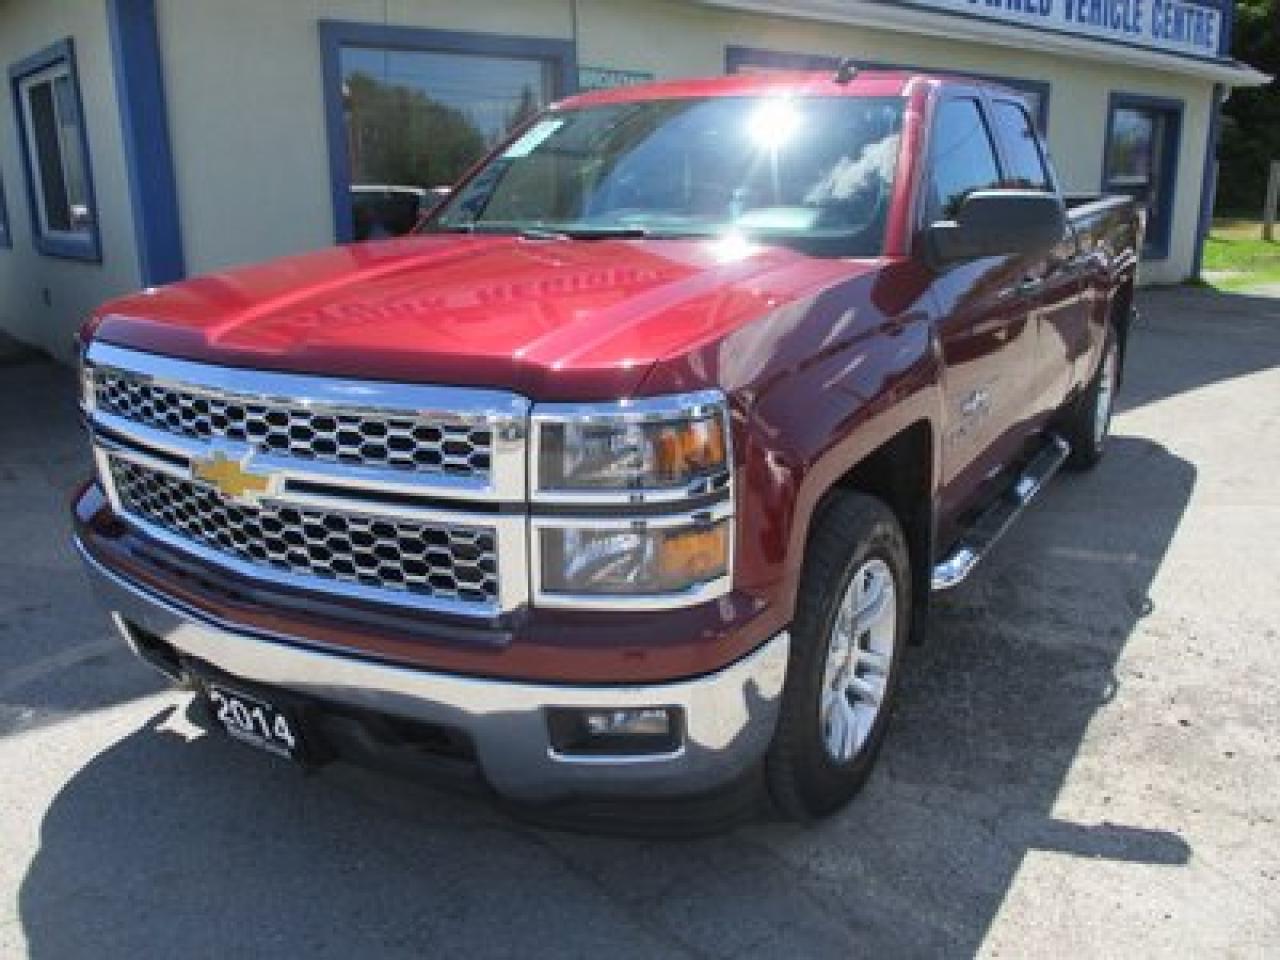 2014 Chevrolet Silverado 1500 WORK READY 'TEXAS-EDITON' 6 PASSENGER 5.3L - V8.. 4X4.. QUAD-CAB.. SHORTY.. TOUCH SCREEN.. BACK-UP CAMERA.. KEYLESS ENTRY..